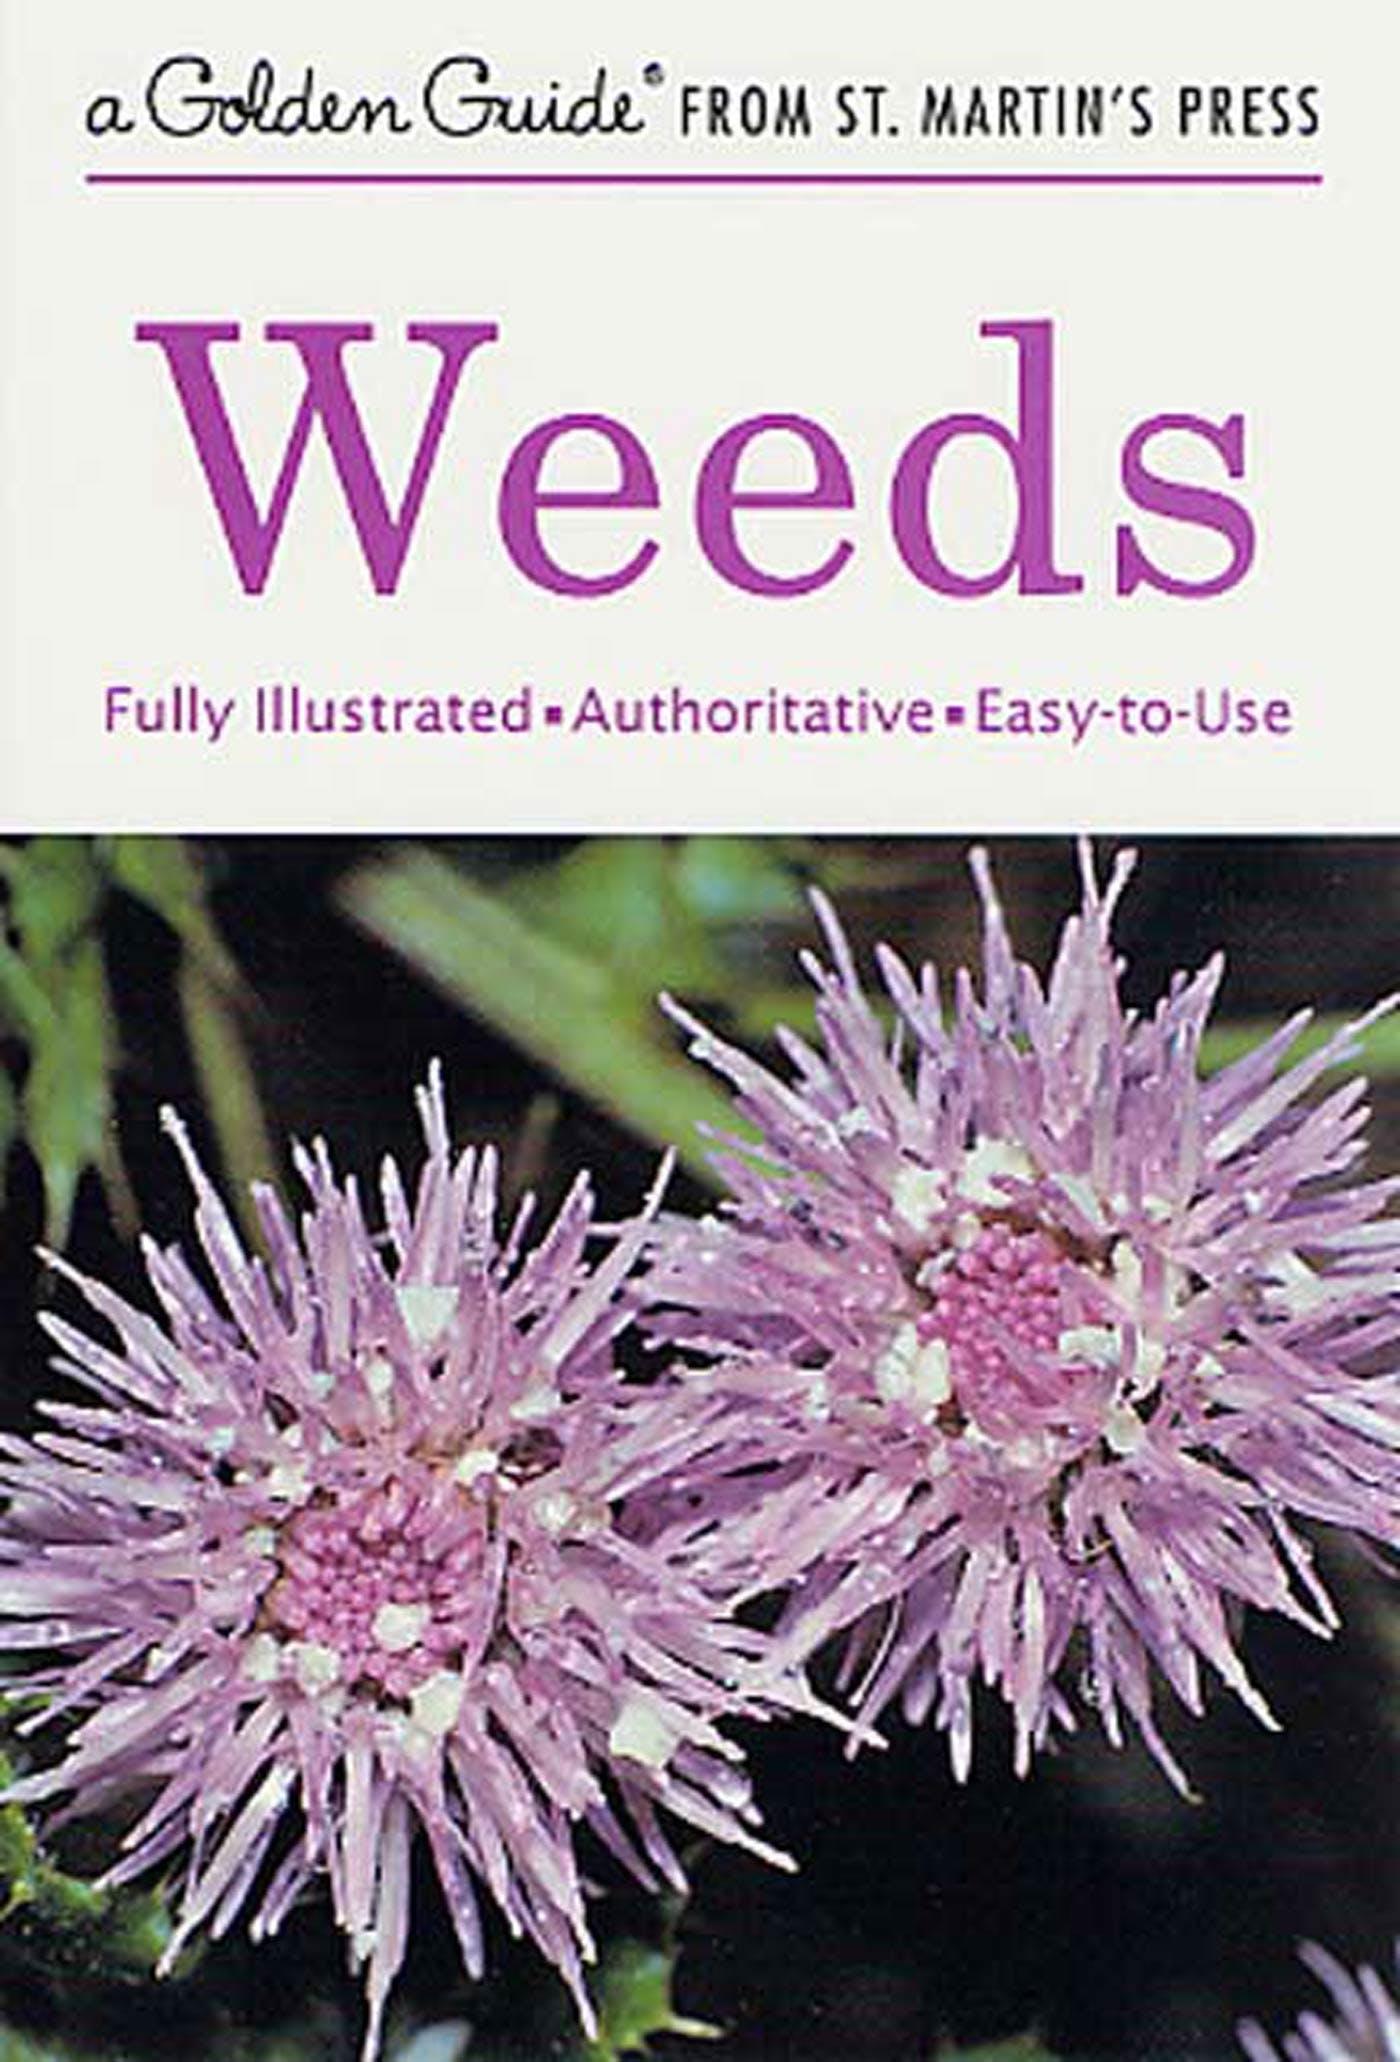 Image of Weeds